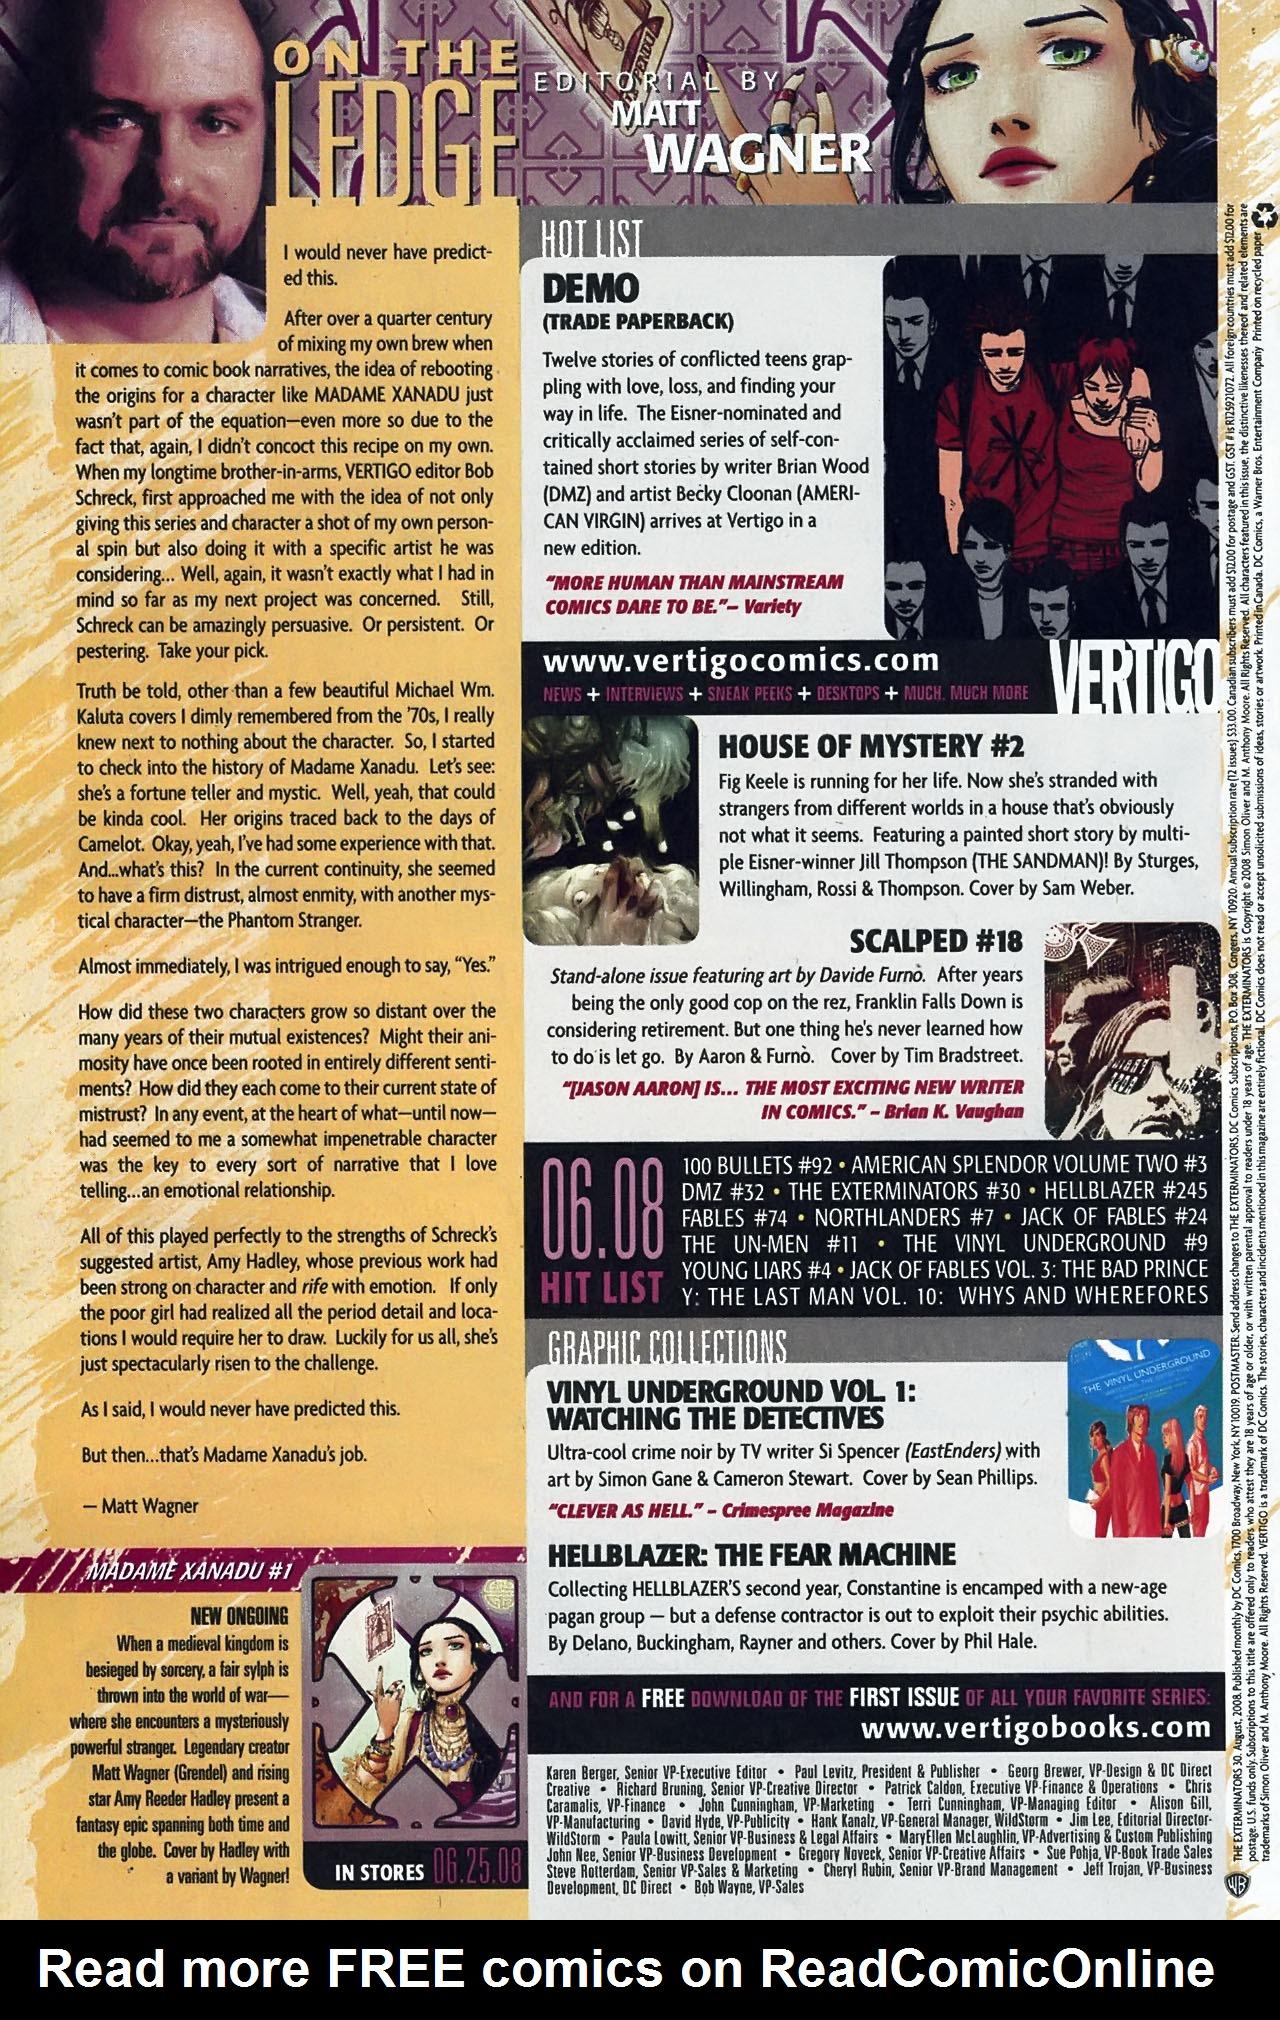 Read online The Exterminators comic -  Issue #30 - 25